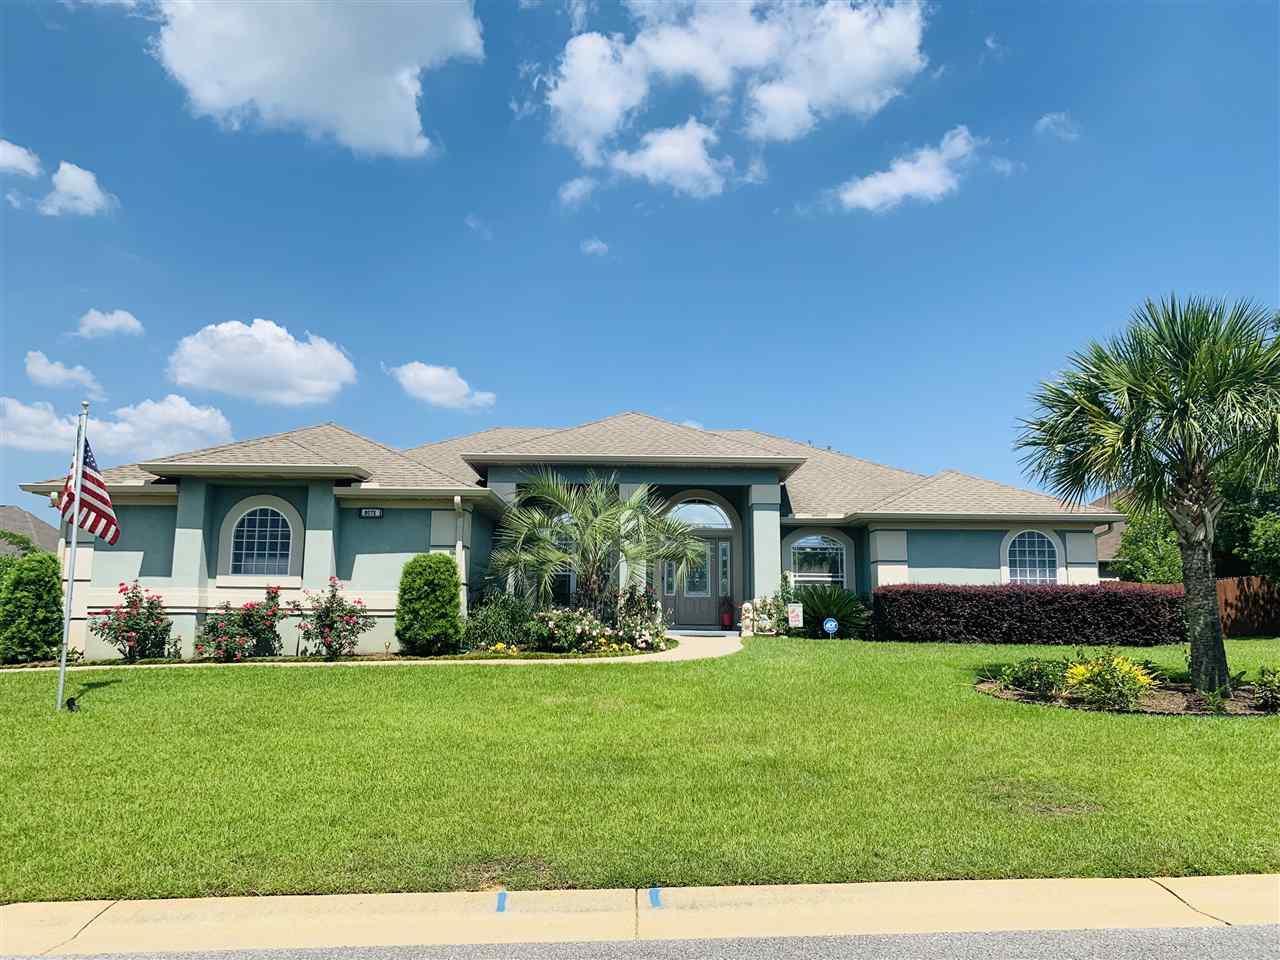 8072 THOROUGHBRED RD, Pensacola, Florida